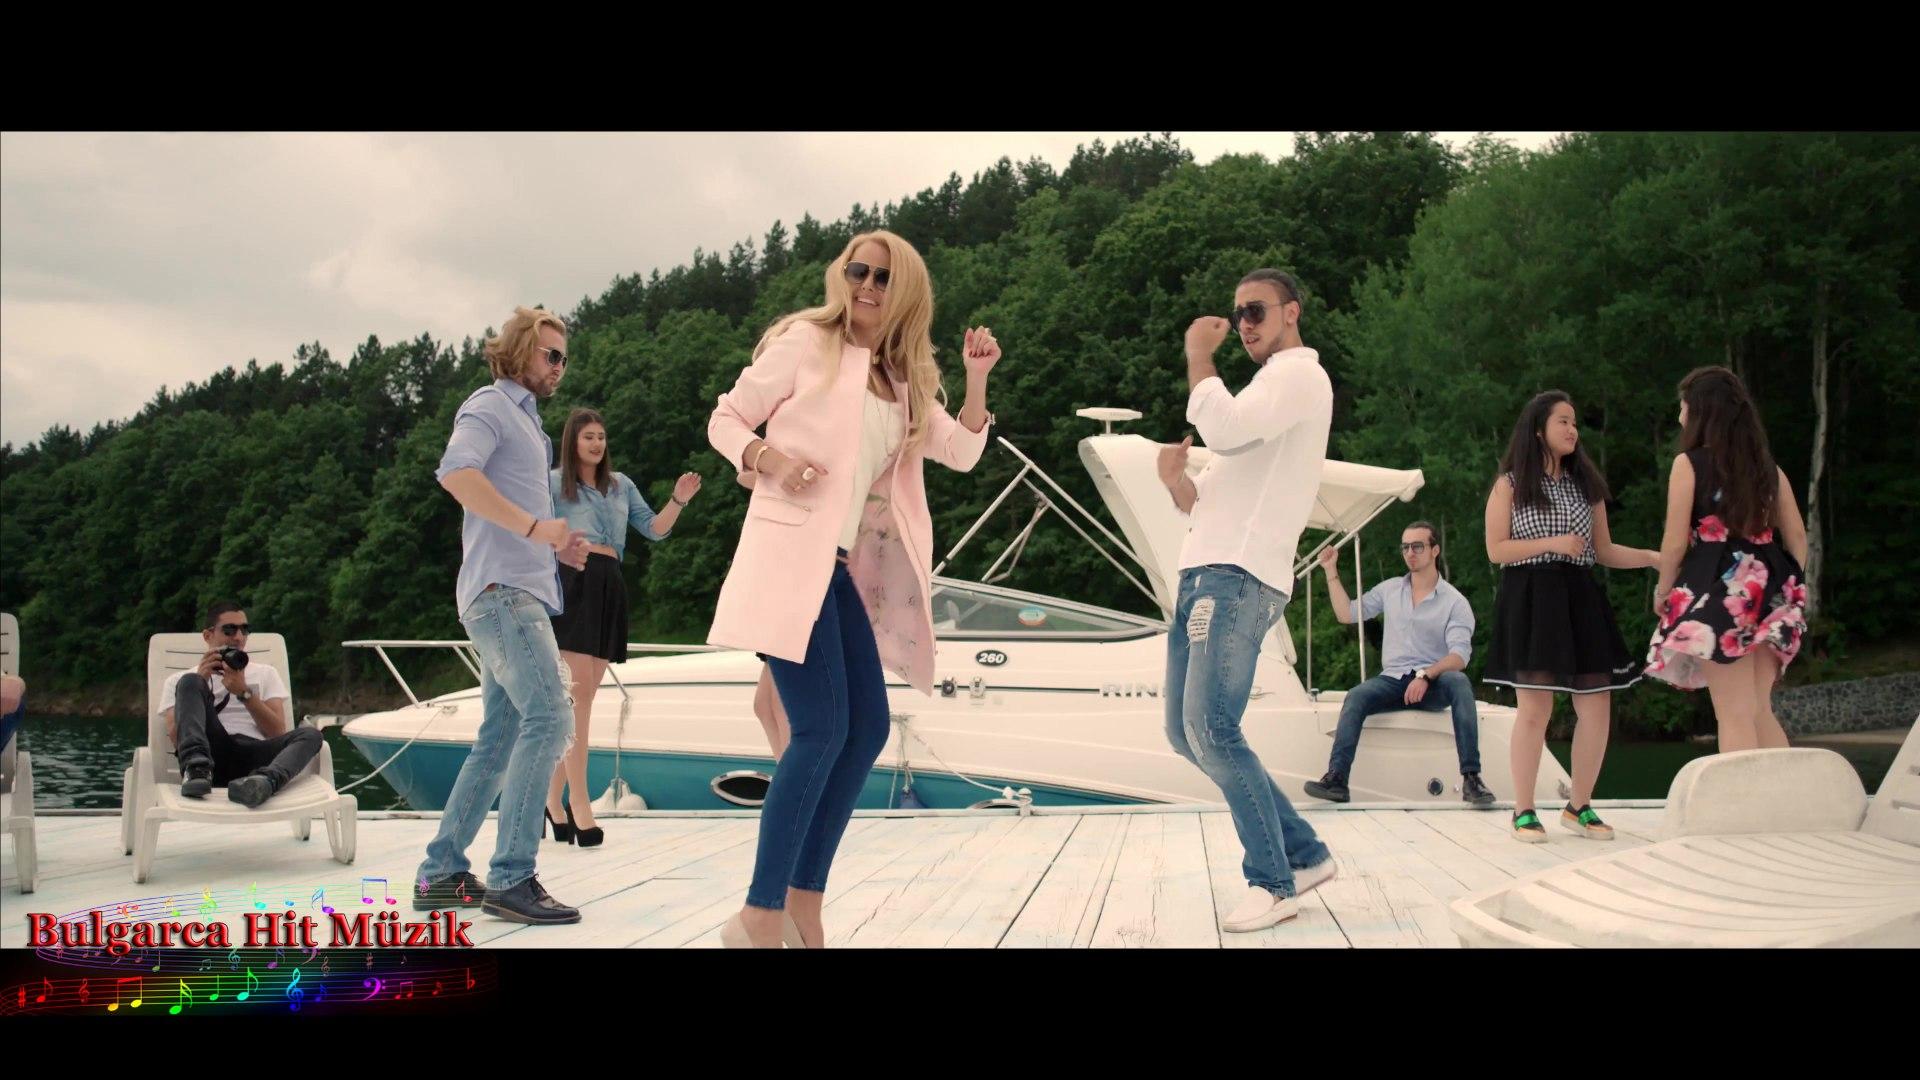 Sonya Nemska ft. Andreas - Pozdravleniya / Соня Немска ft. Andreas - Поздравления (Ultra HD 4K - 201